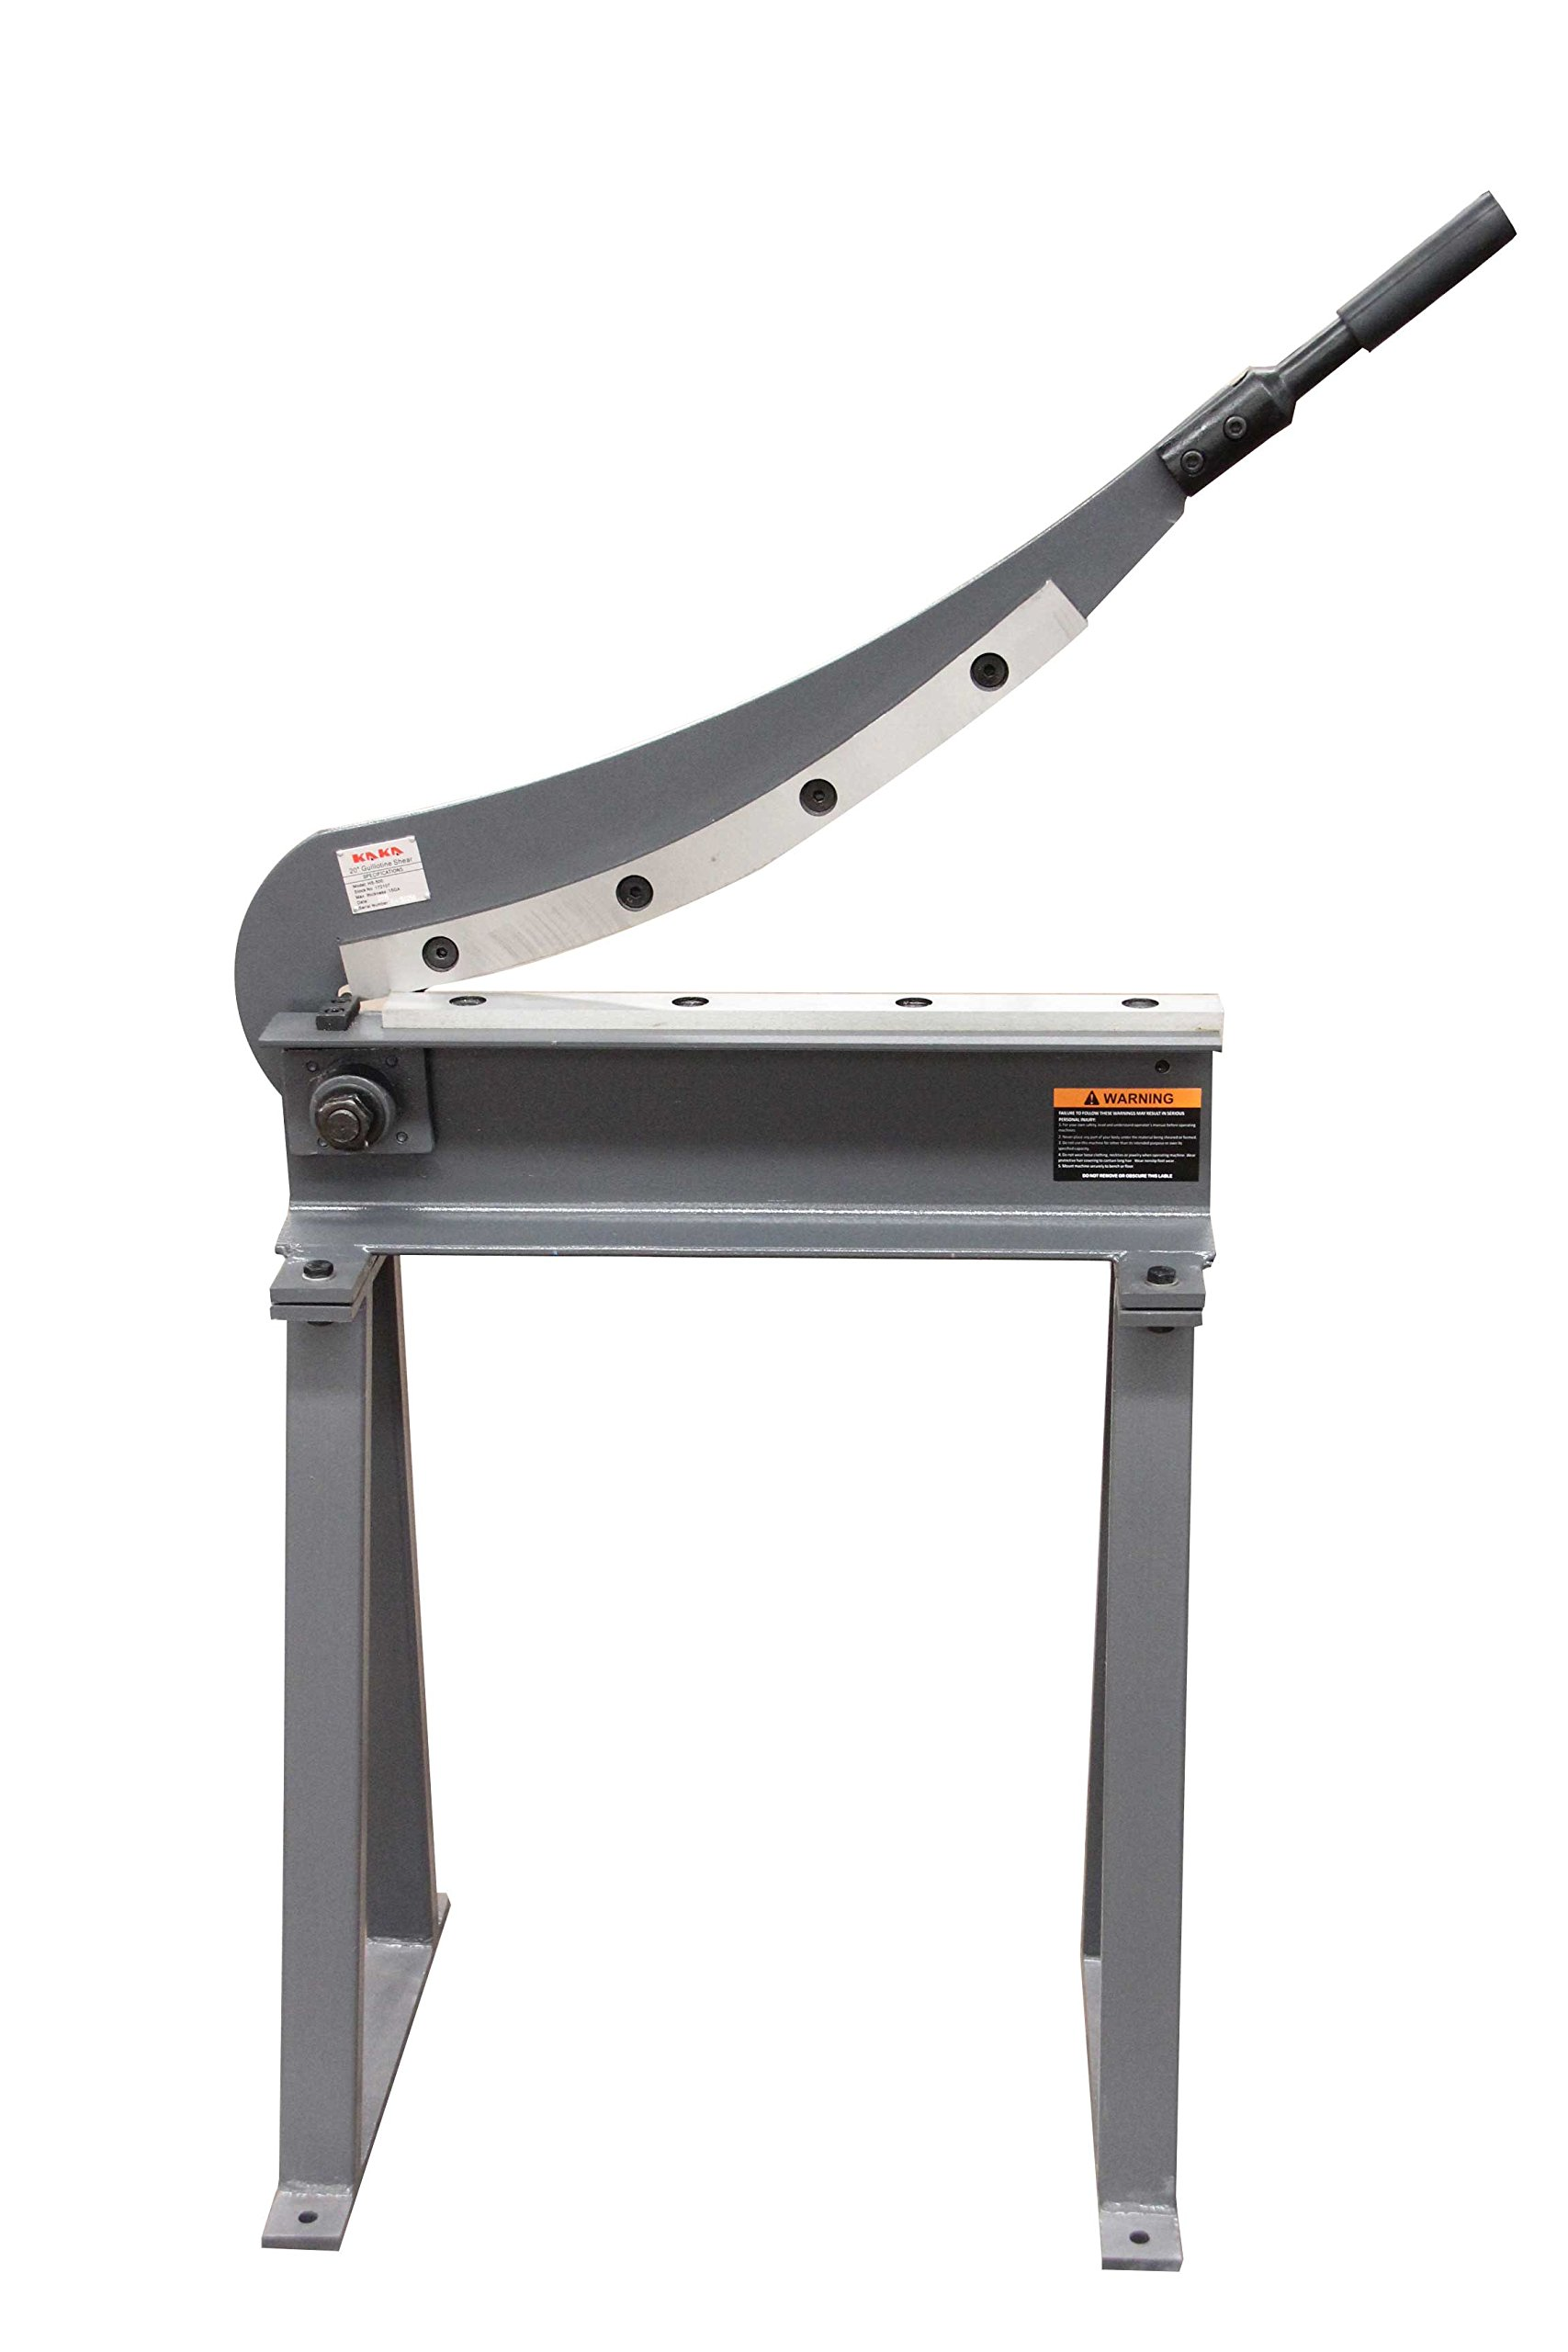 KAKA Industrial HS-500 Sheet Metal Plate Cutting Shear, 20inch Width 16Ga Manual Guillotine Shear With Stand